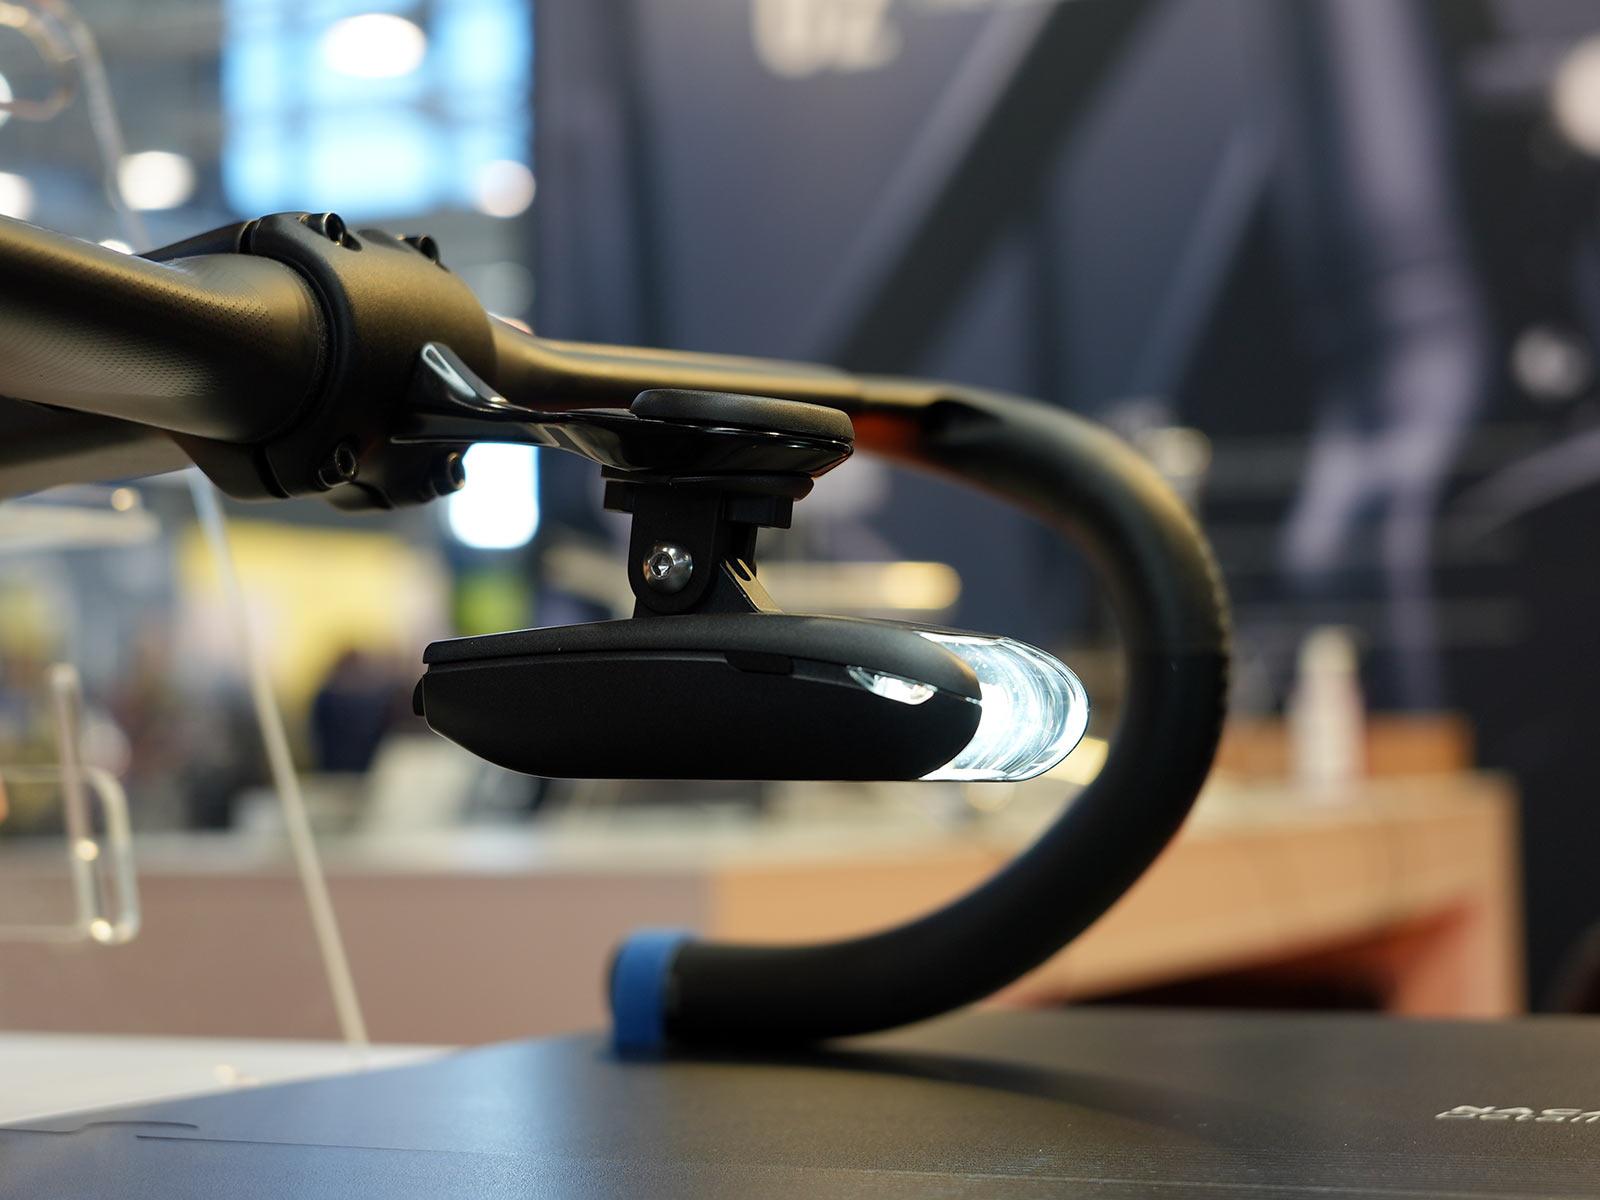 lightskin naca profile aerodynamic bicycle head light